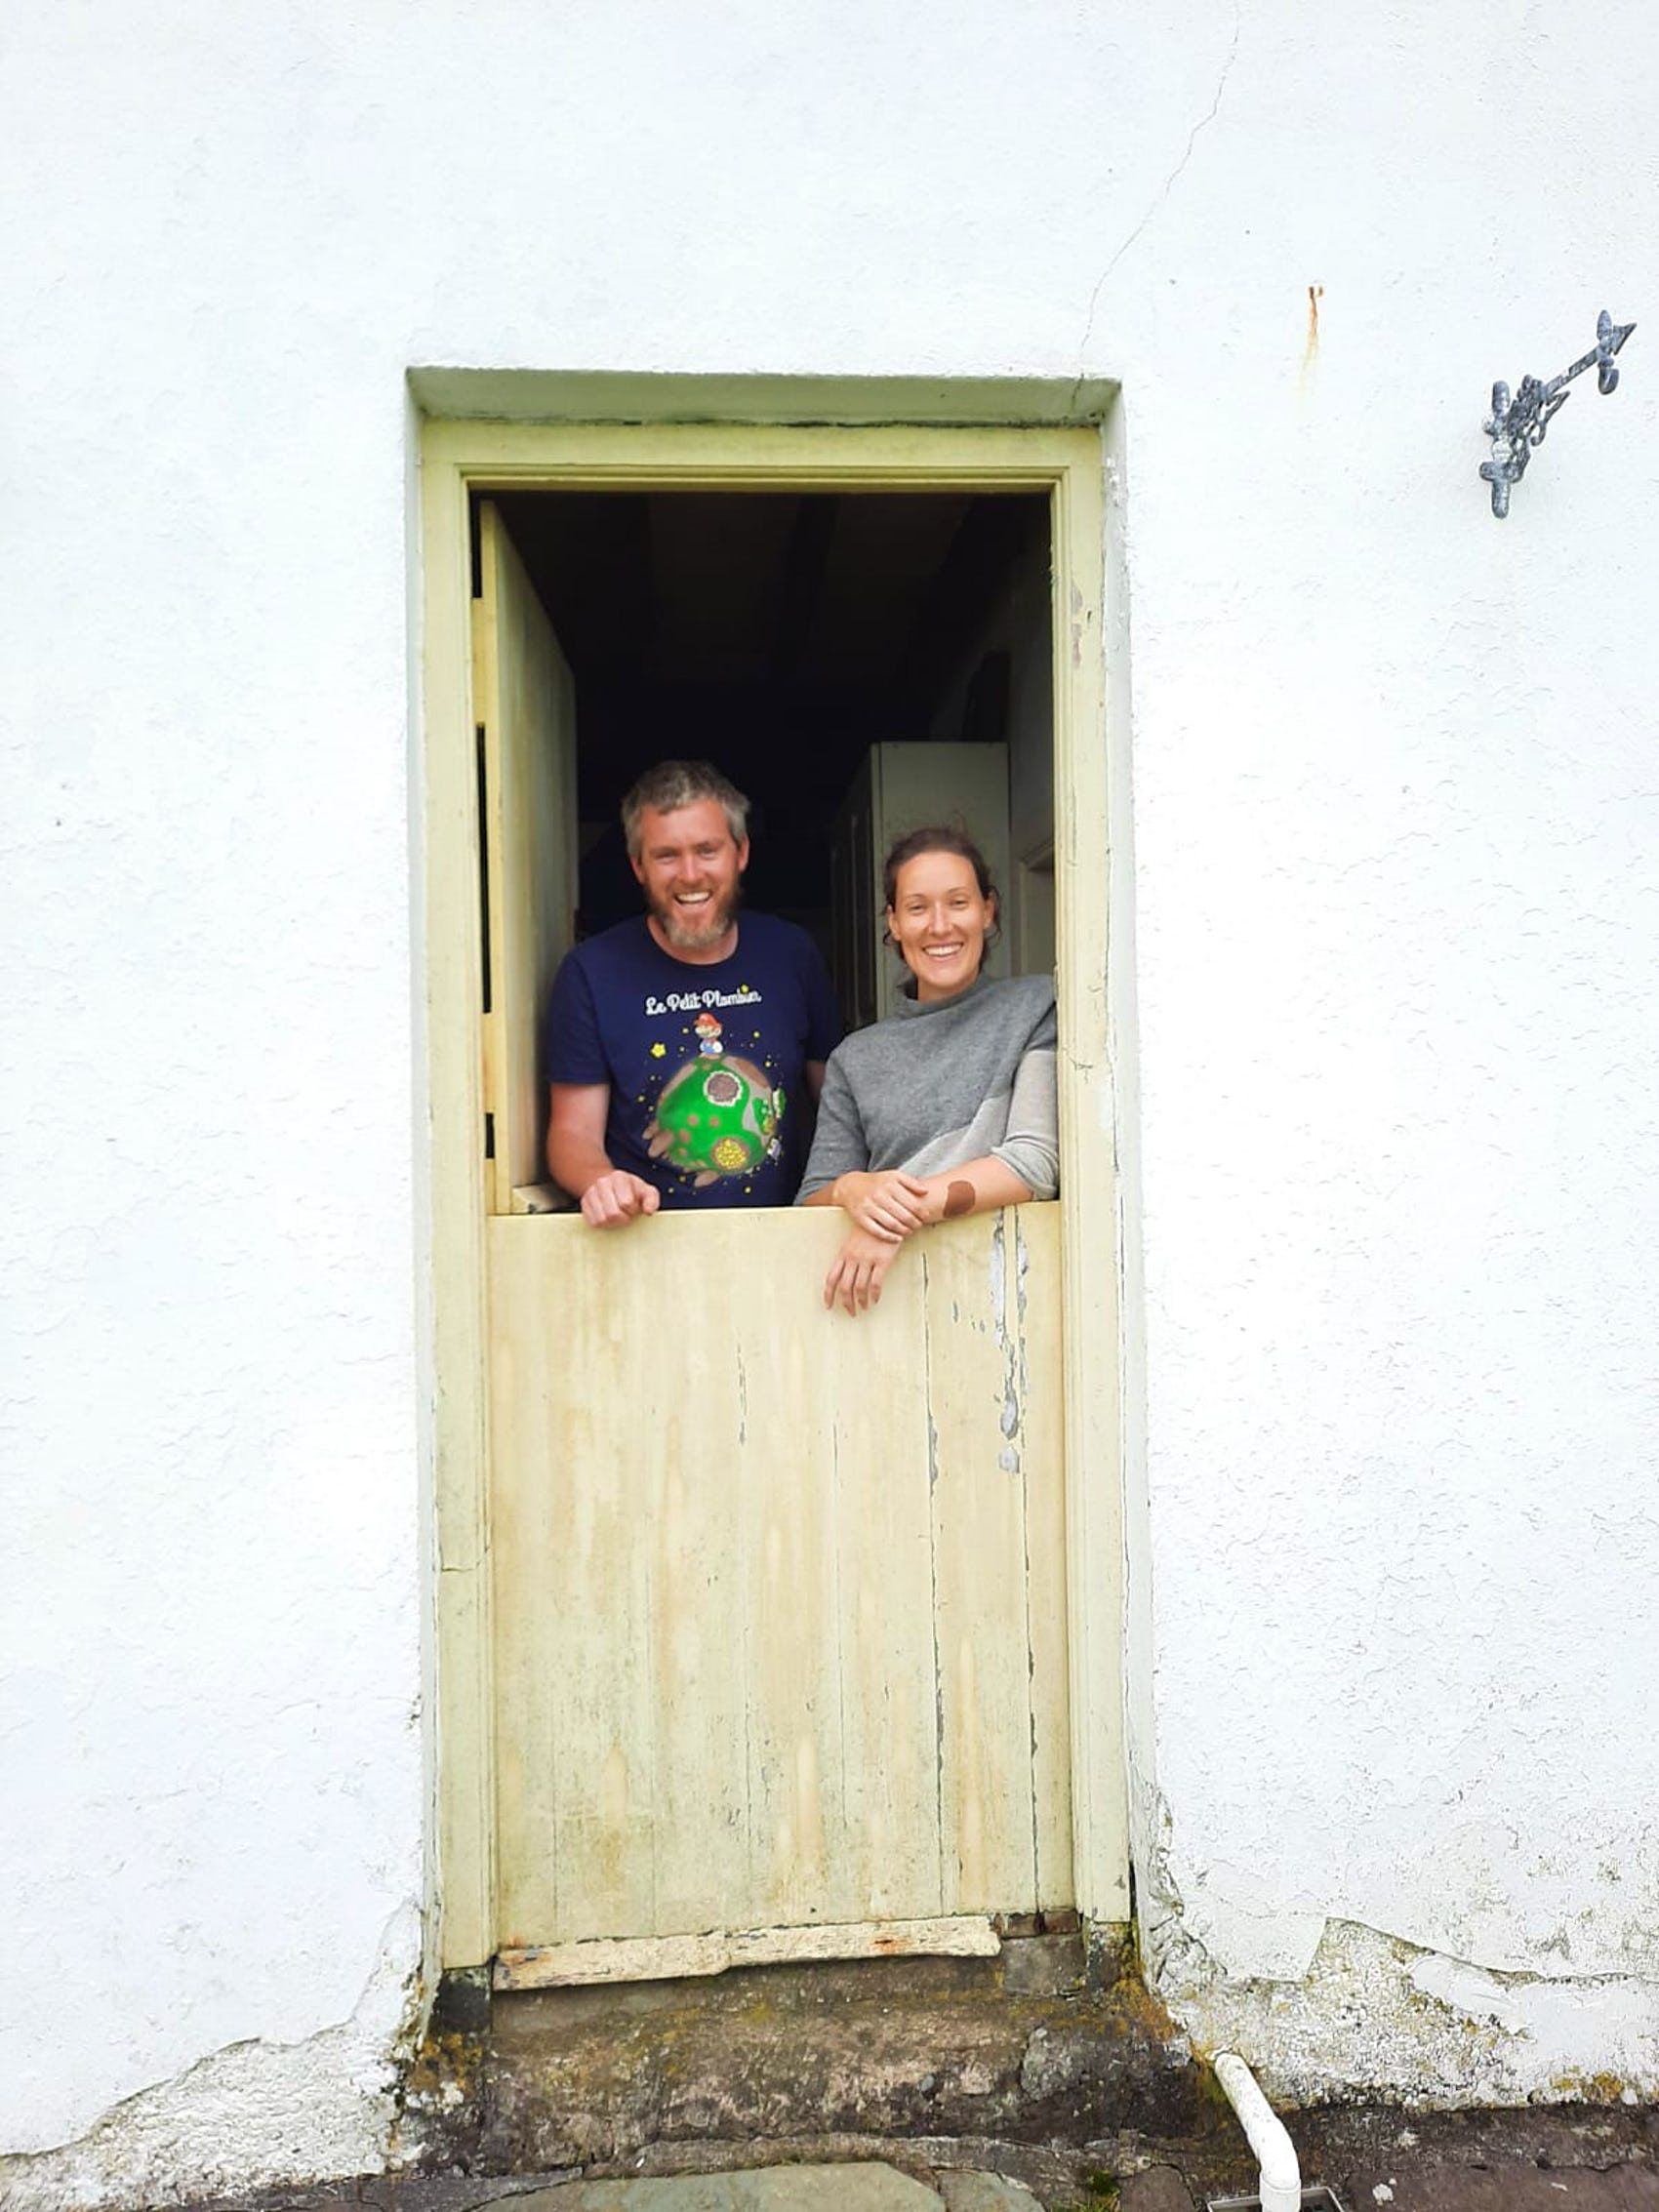 Annie Birney and Eoin Boyle (Great Basket Island)